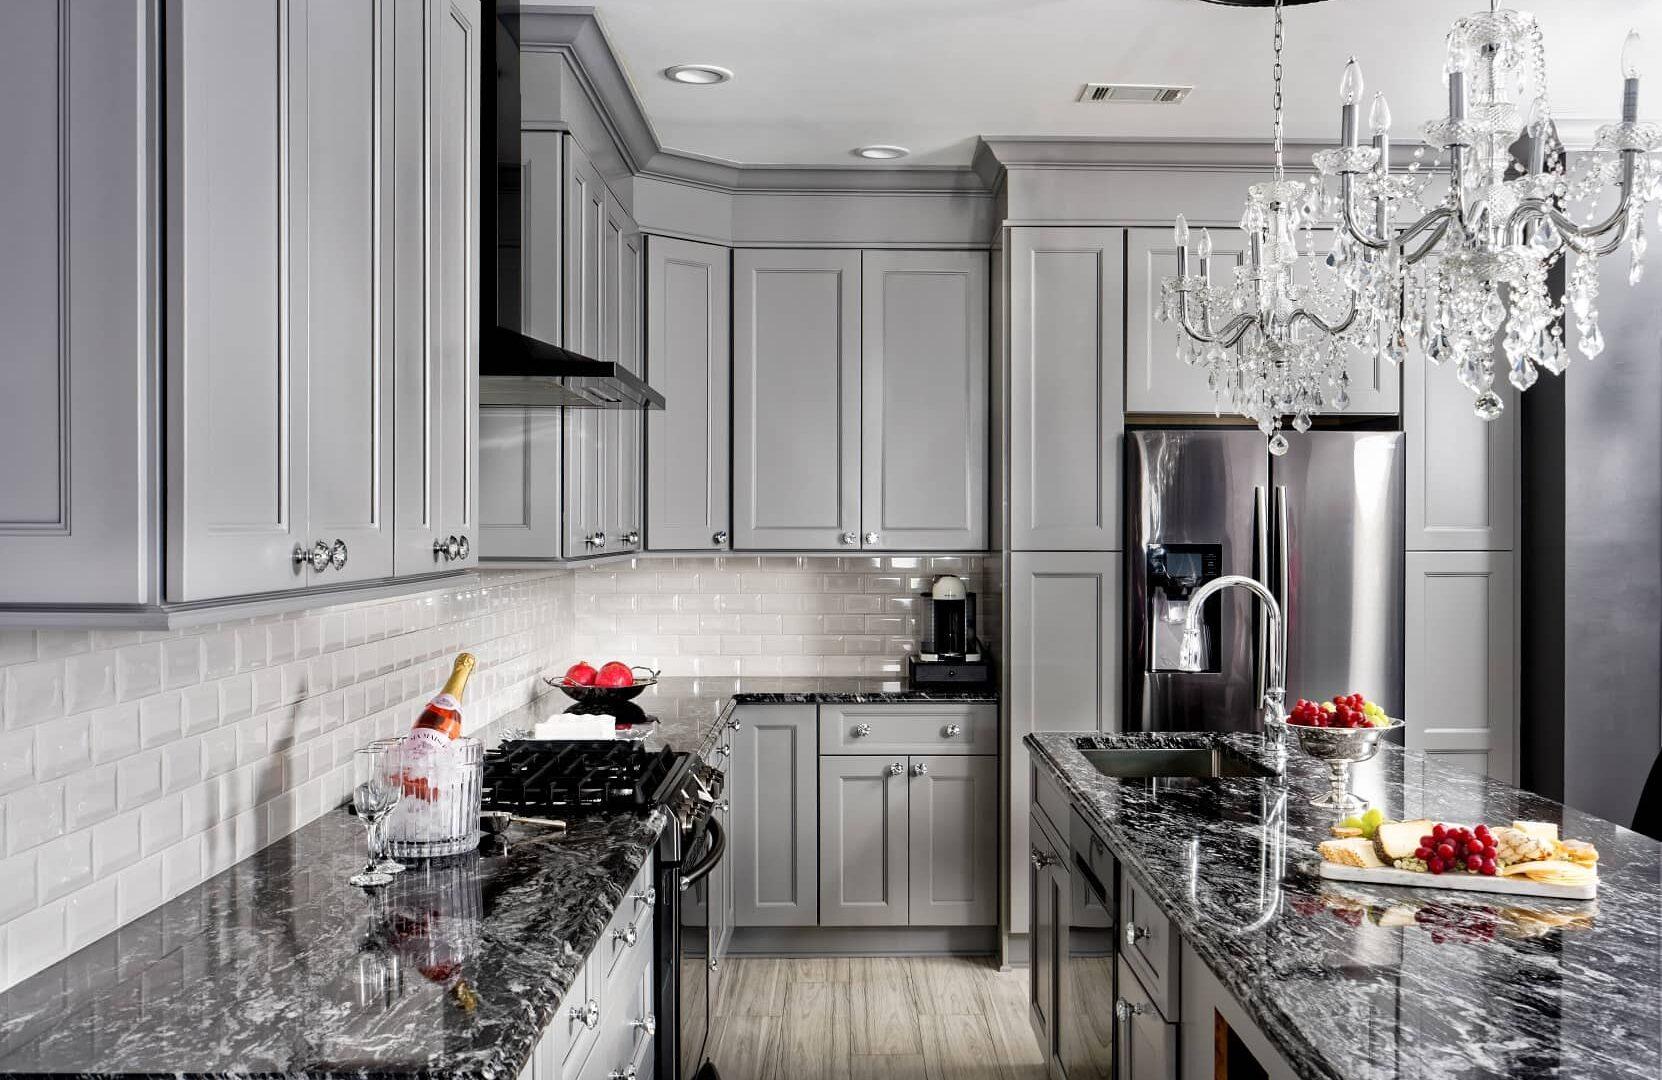 Kitchen Design, Kitchen Design Models, Kitchen Design Ideas, Videos, Lighting, Red, Colours, Best,Coastal, Storage, Little, Tips